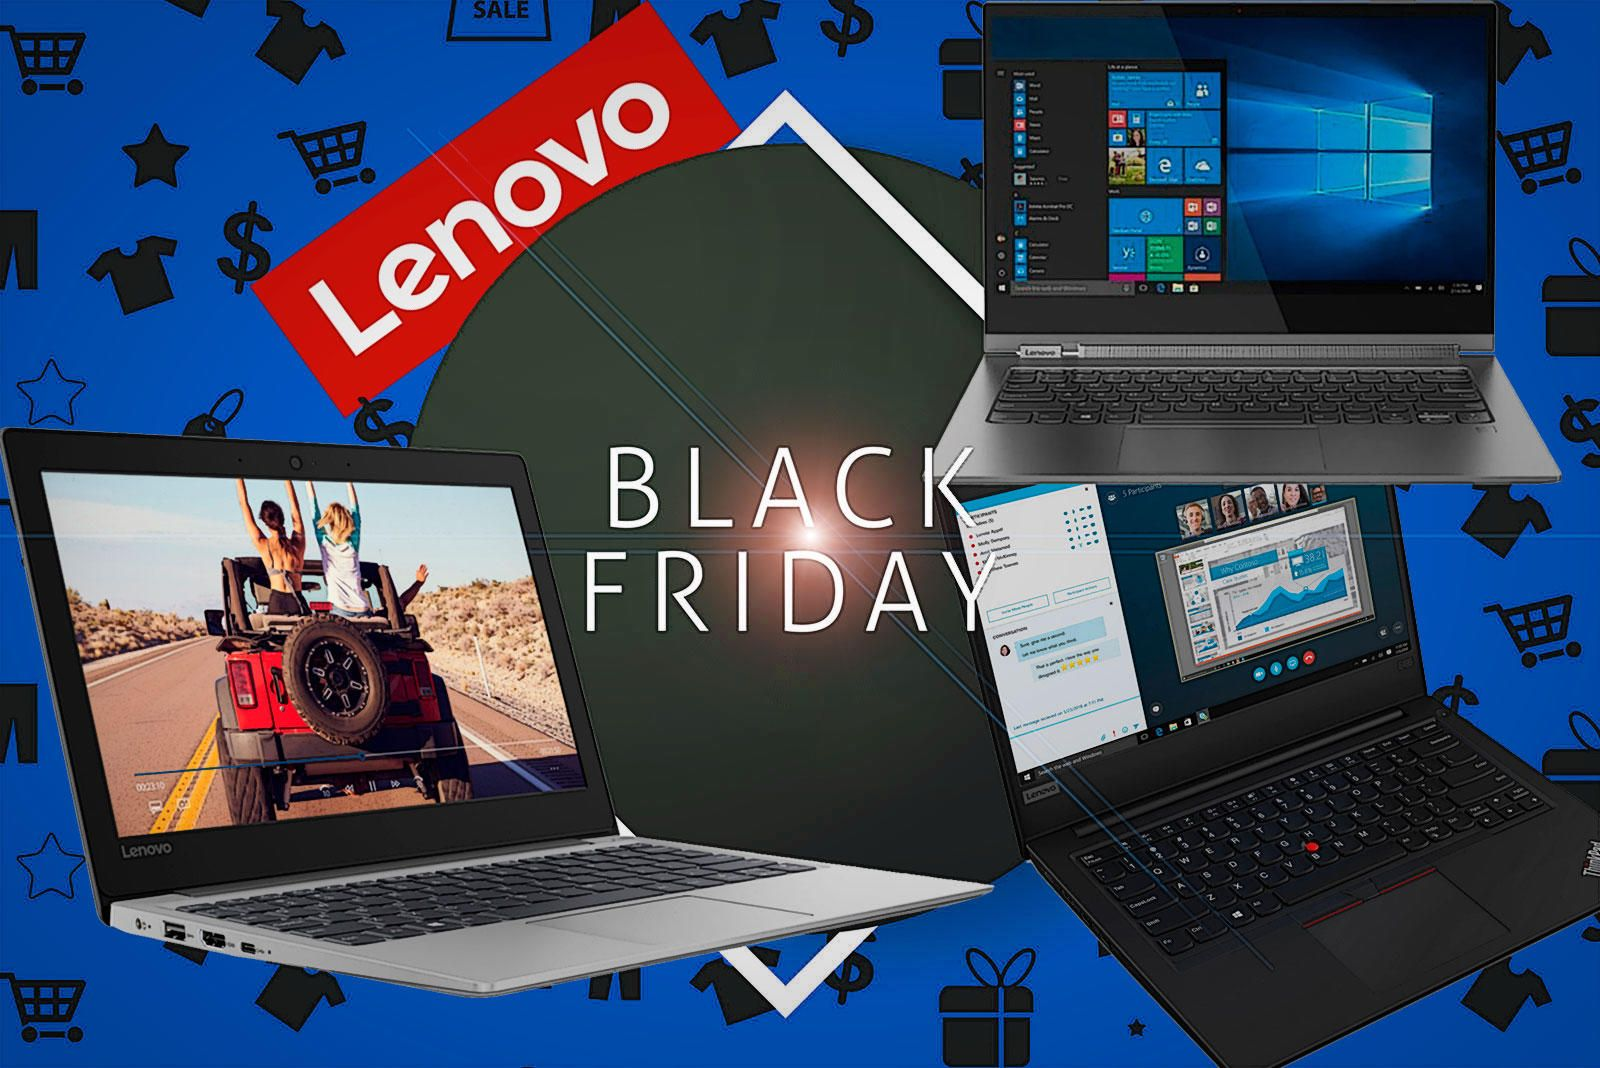 Lenovo Black Friday 2020 Deals Grab Discount On Lenovo Products Lenovo Black Friday Laptop Black Friday Laptop Deals